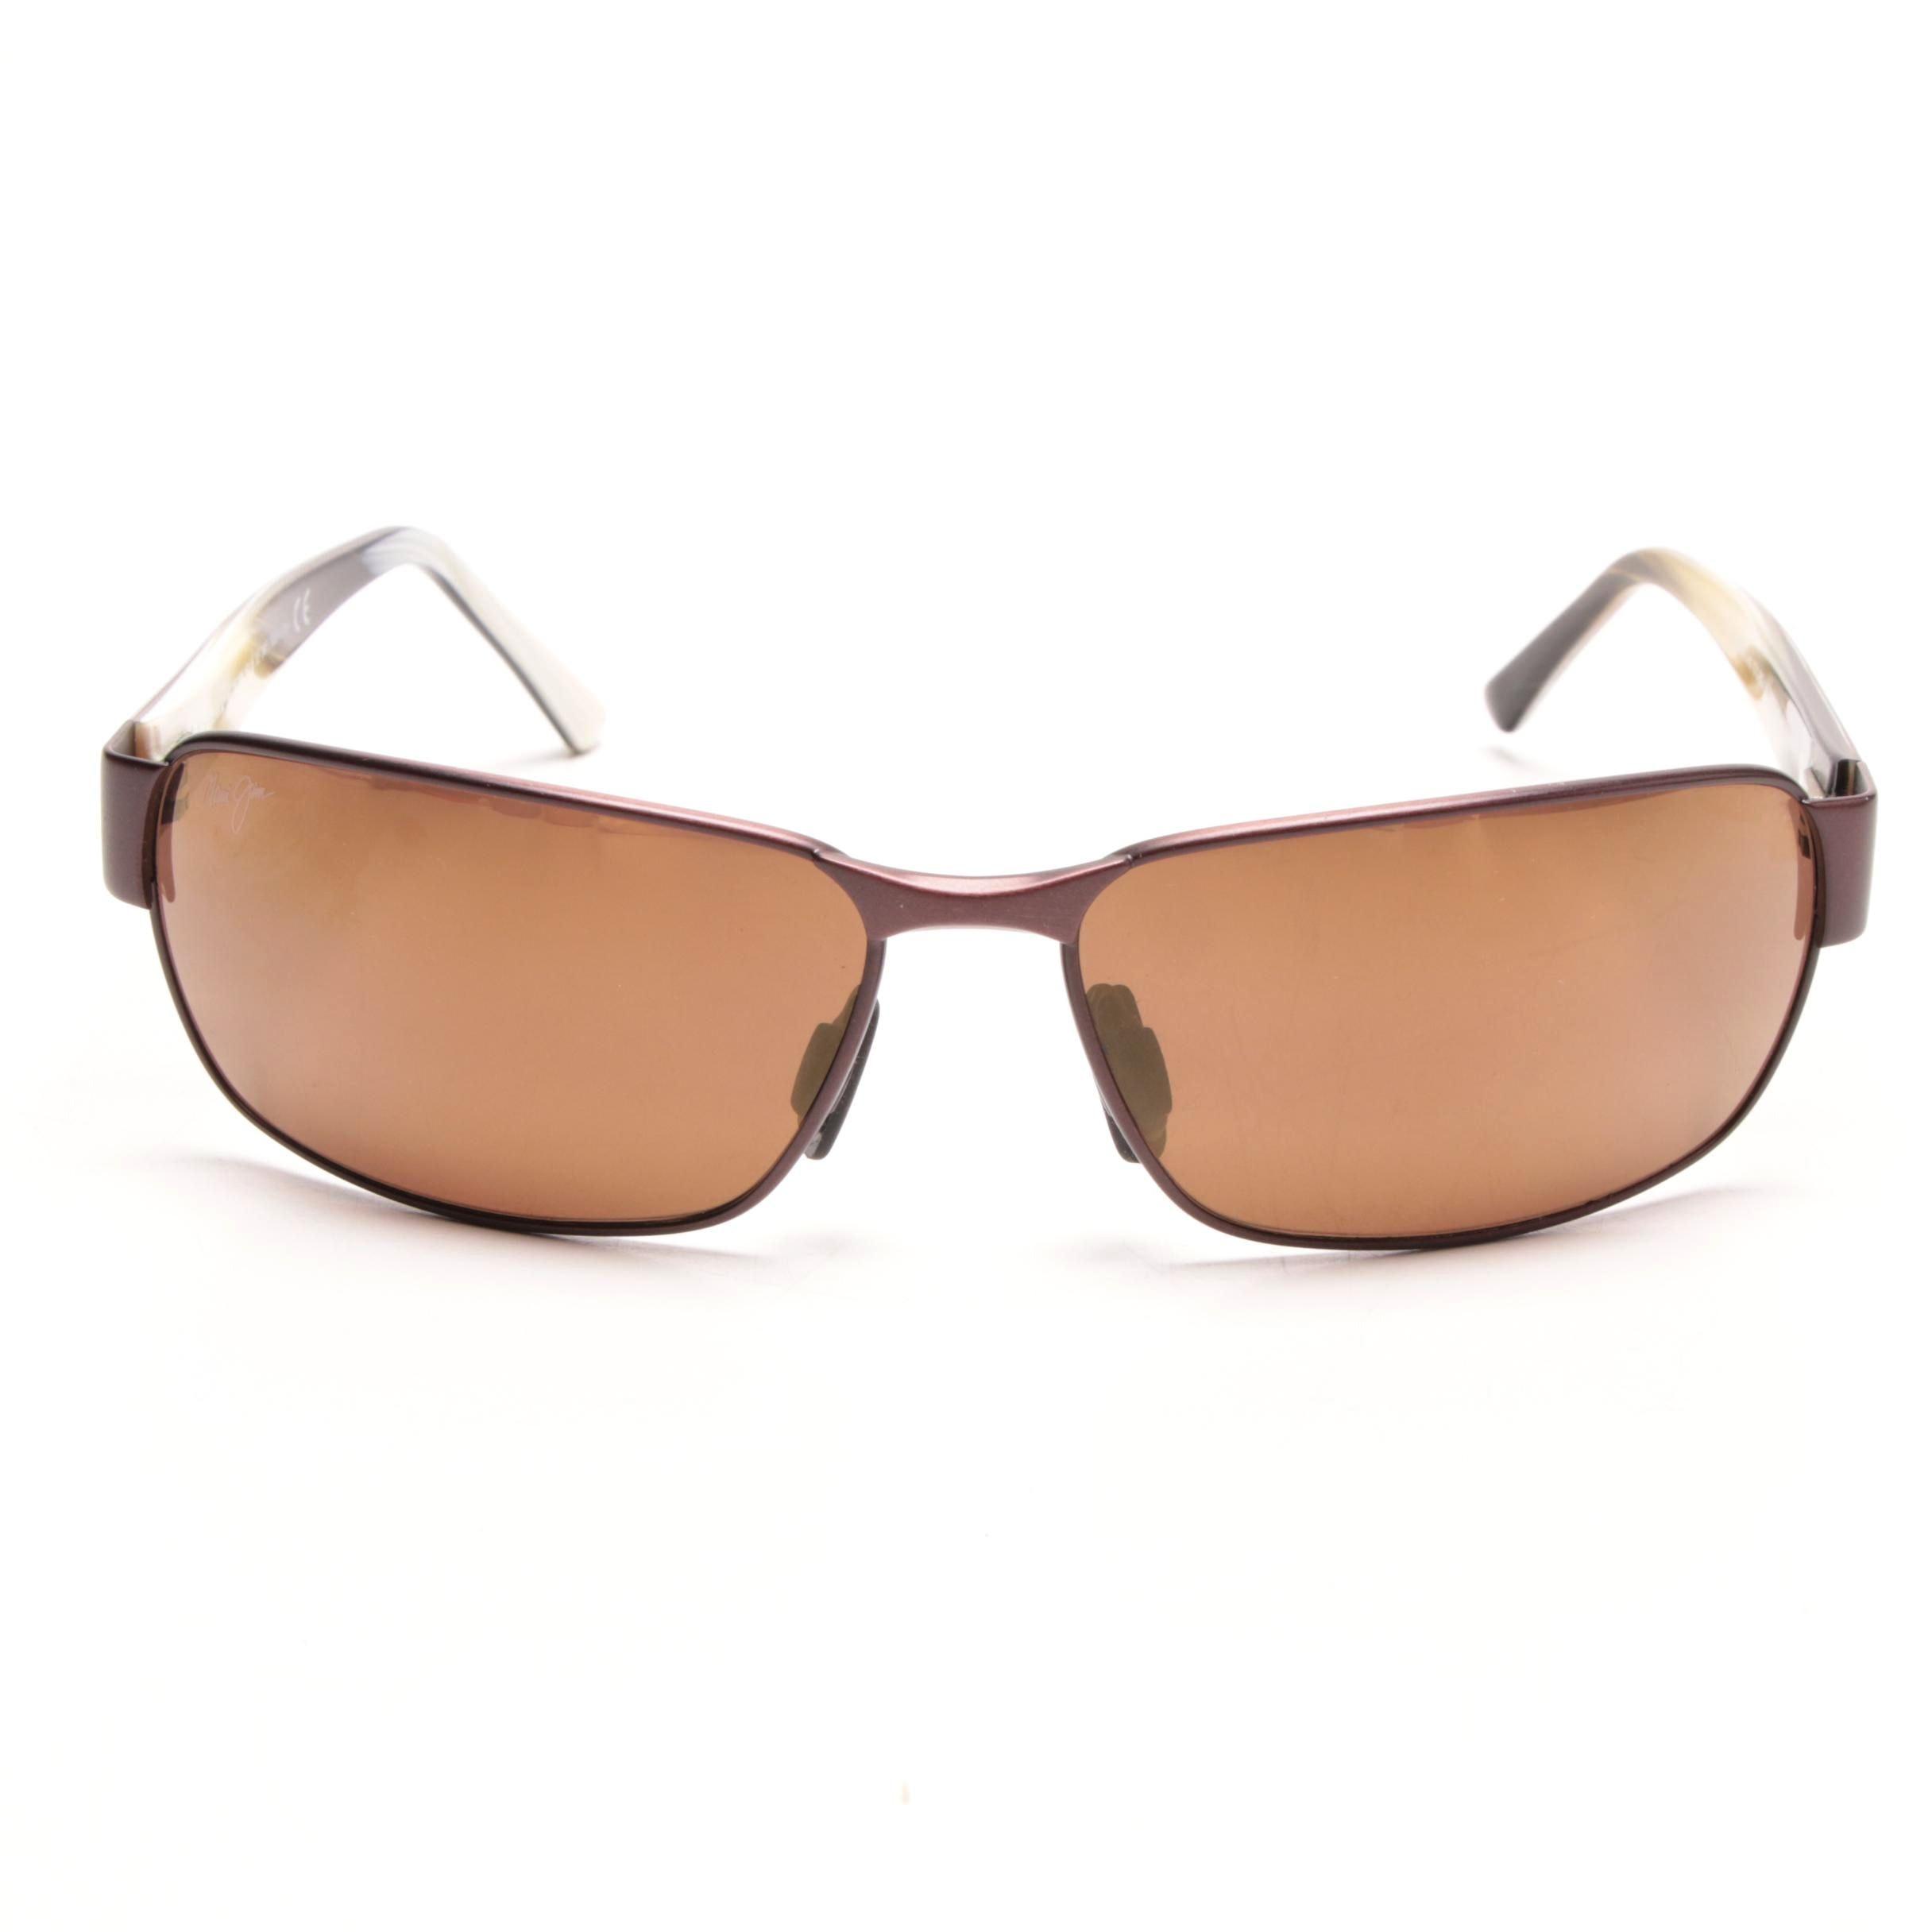 Maui Jim Black Coral Sunglasses with Case